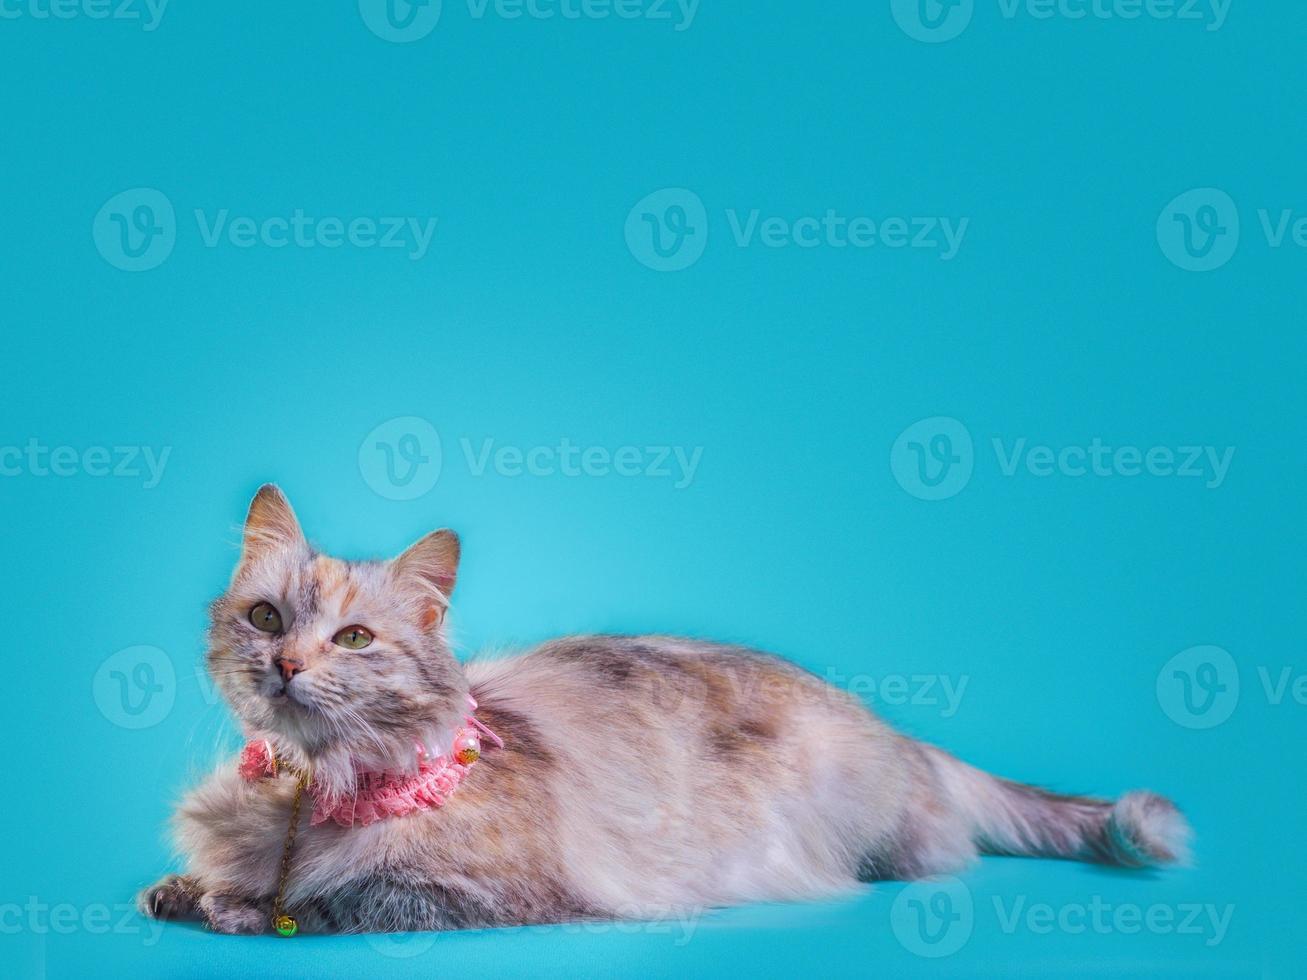 Medium hair cat on a blue background photo